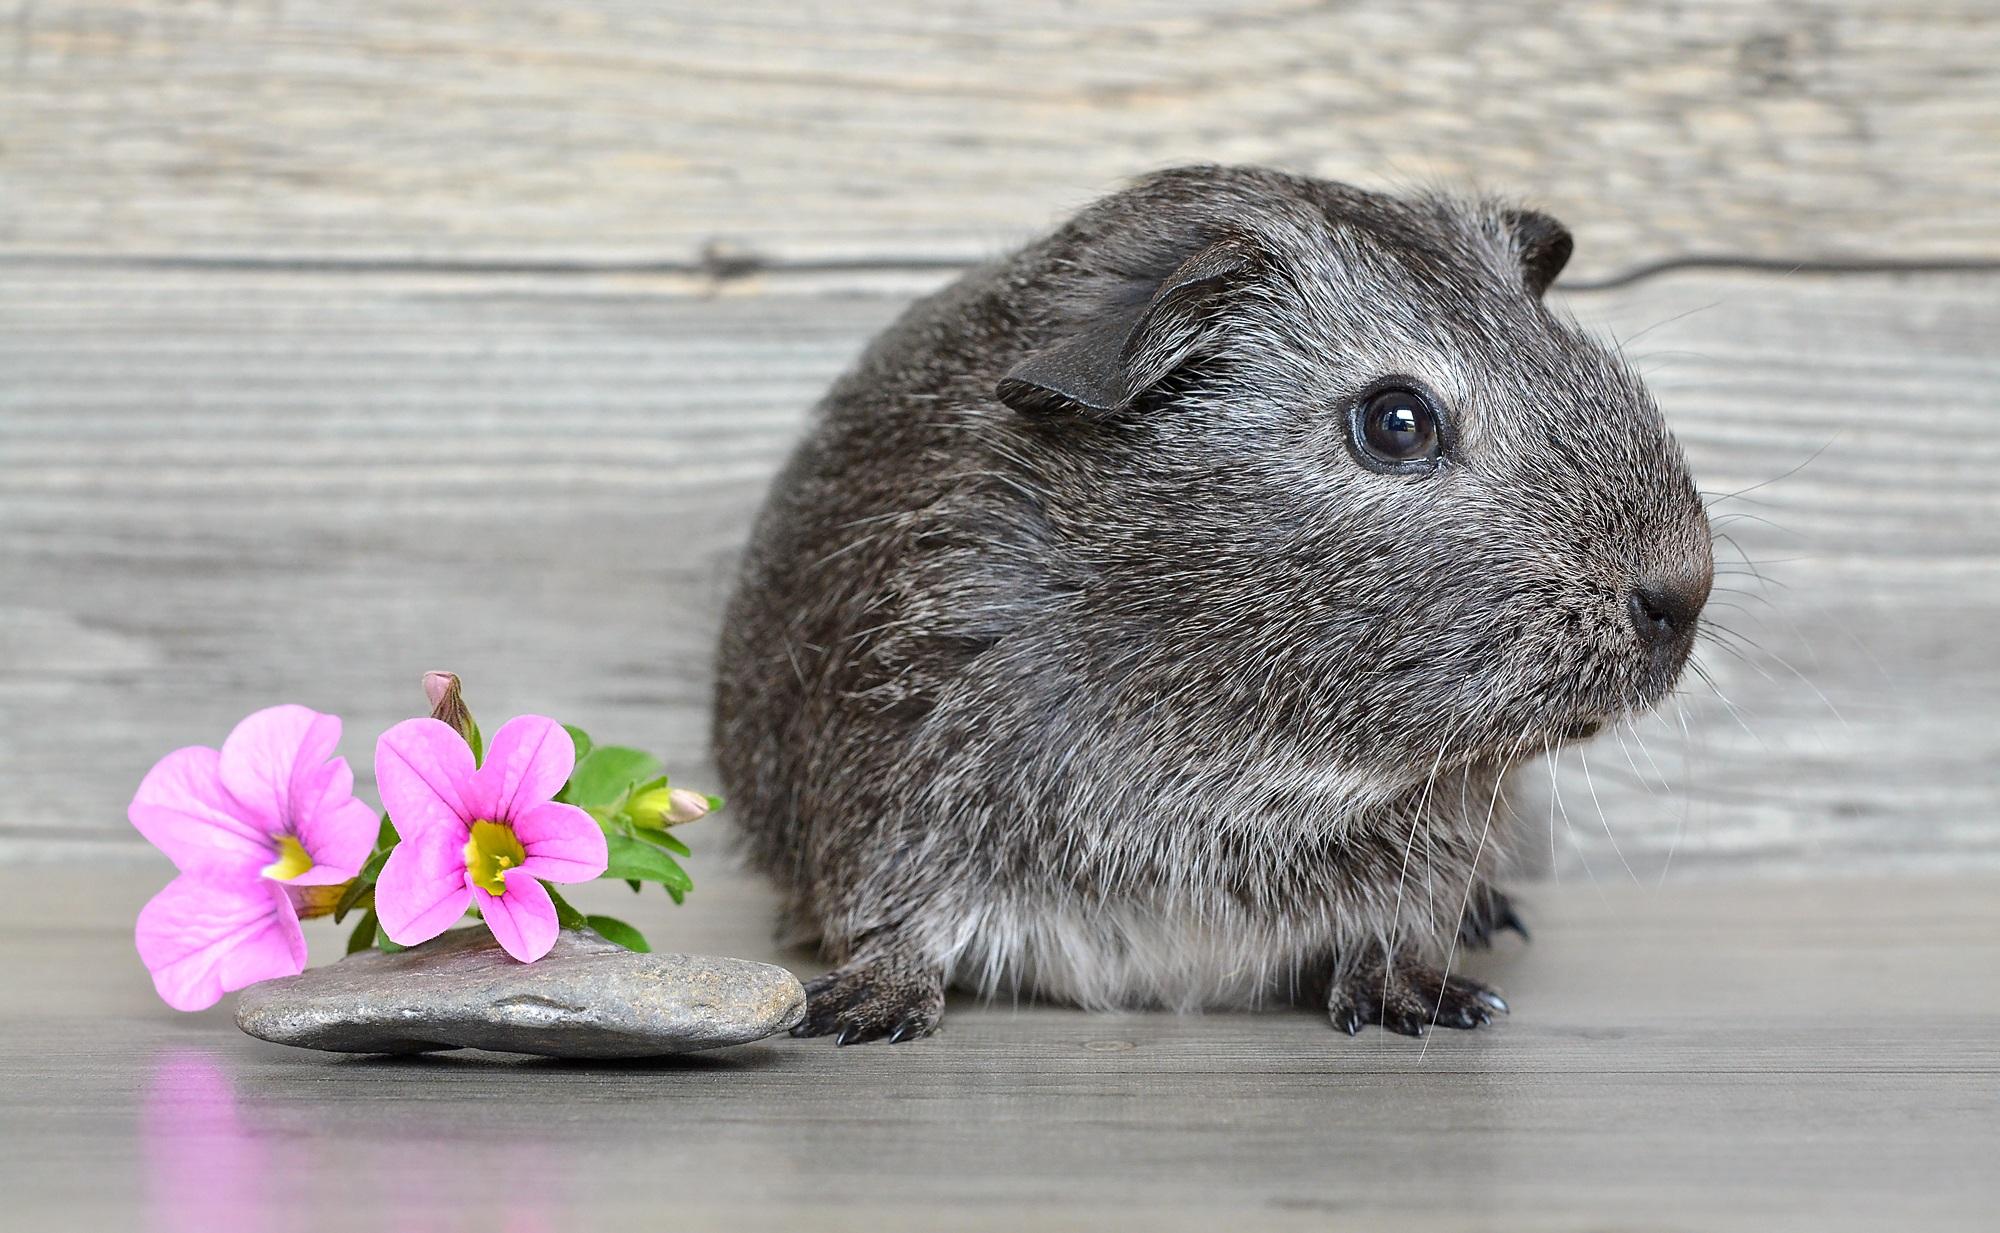 Adorable, Animal, Cute, Guinea, Little, HQ Photo